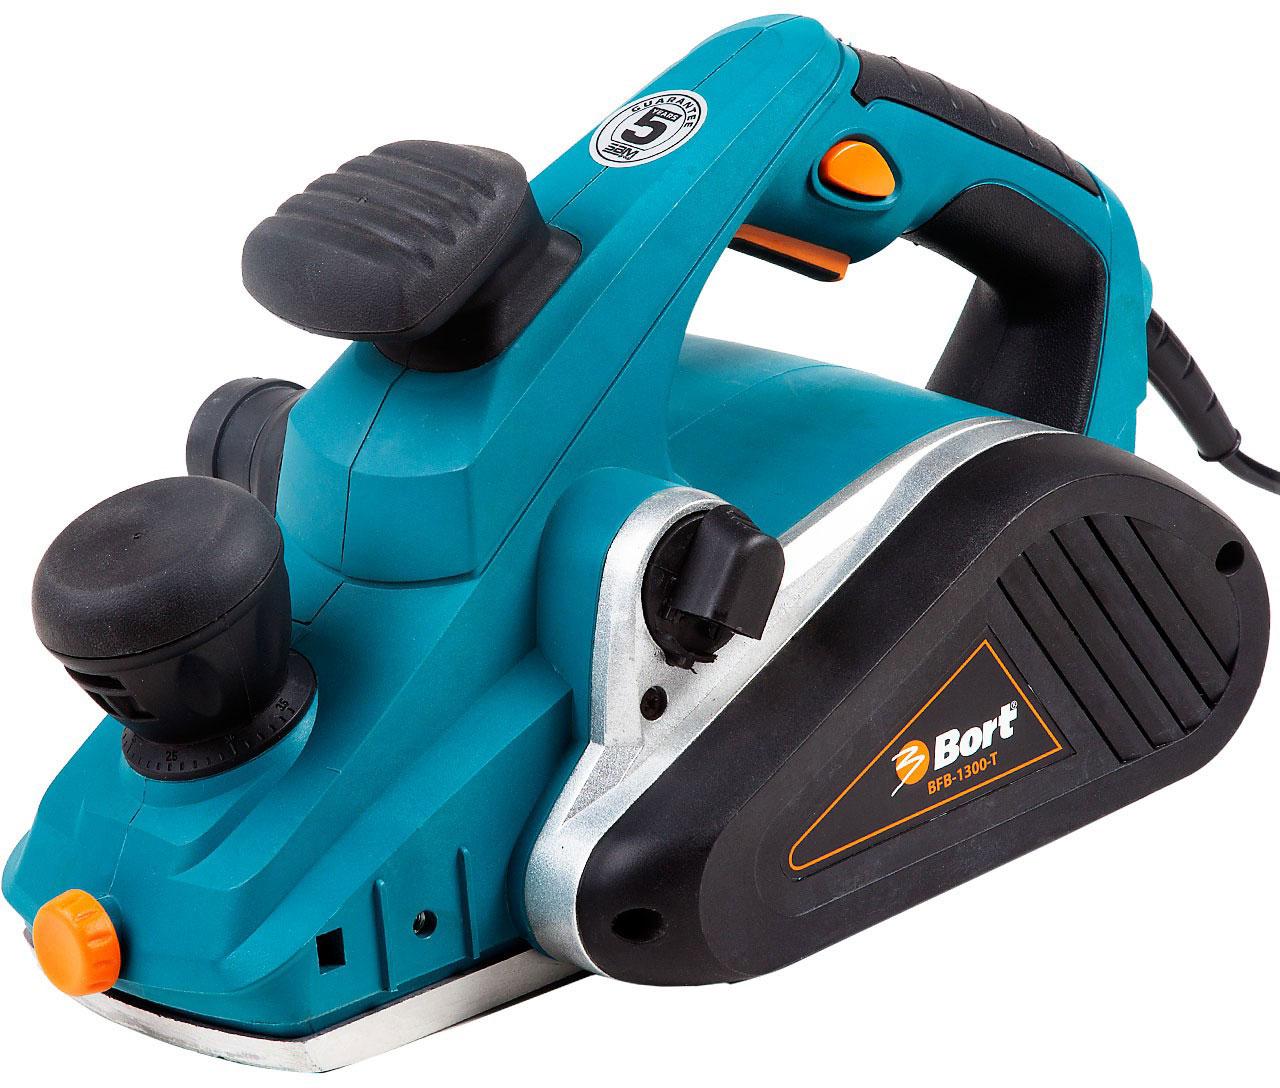 Bort BFB-1300-T (98298611) - электрический рубанок (Blue) от iCover